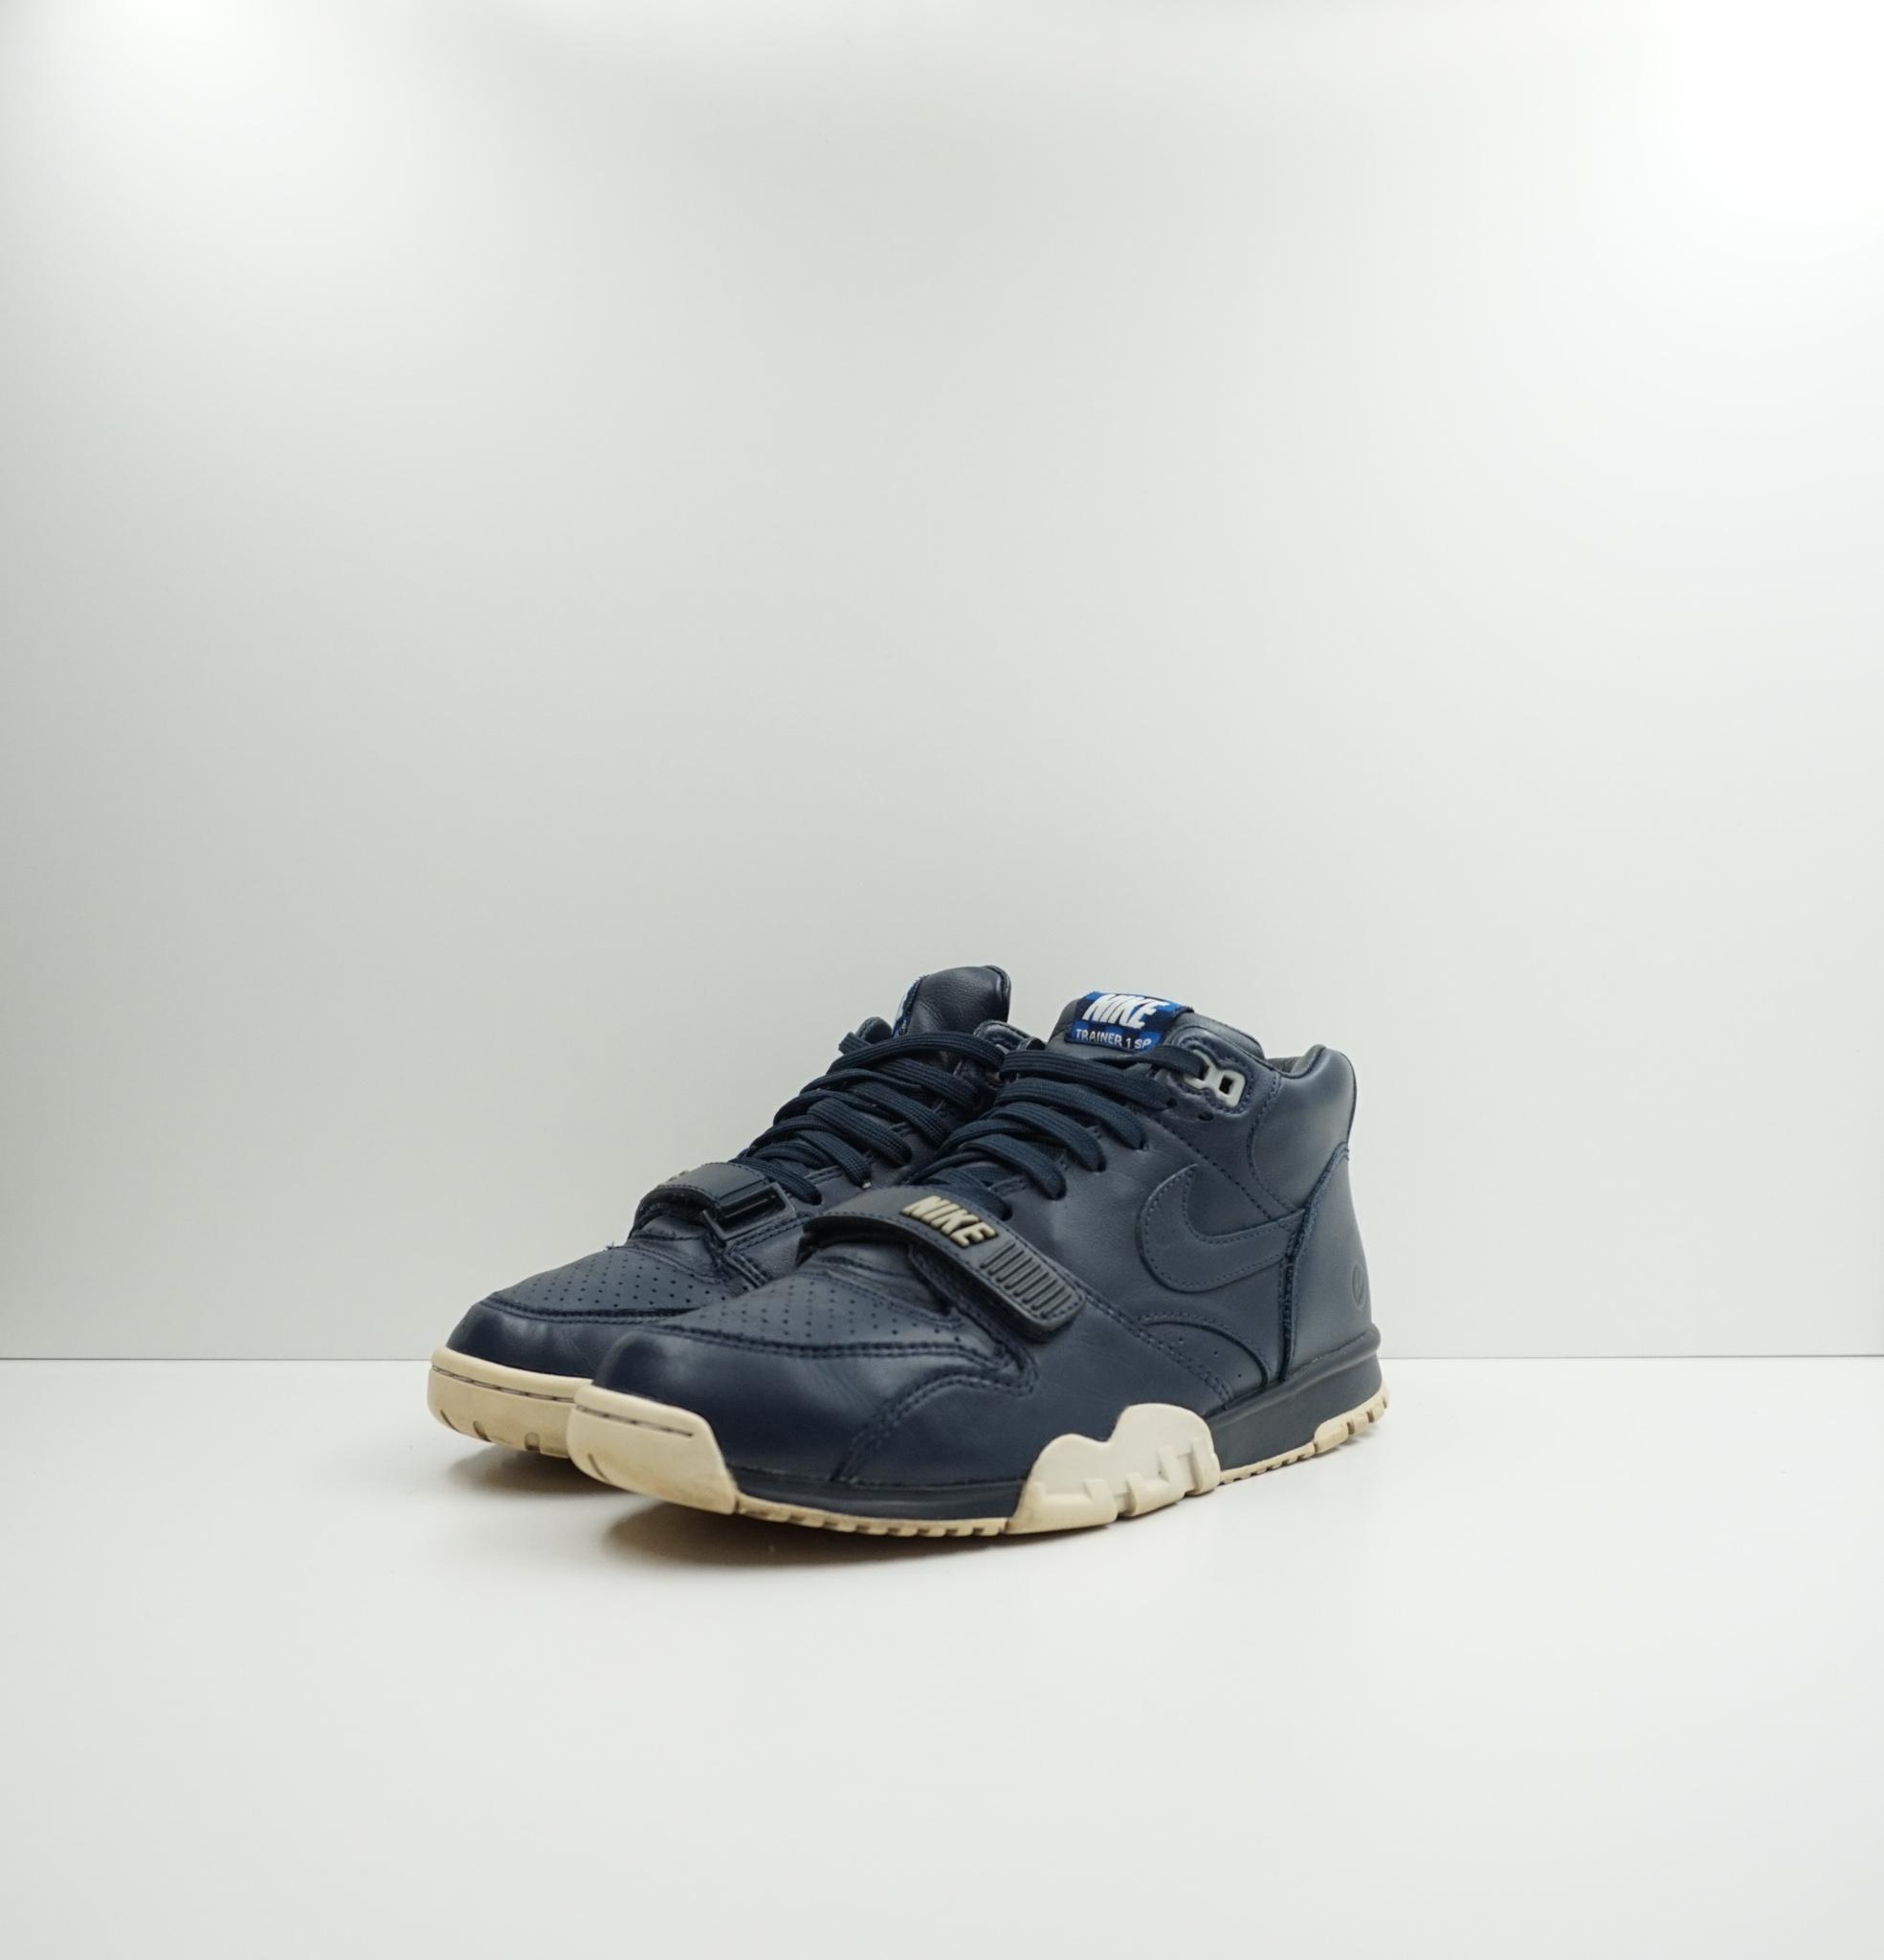 Nike Air Trainer 1 Fragment Design Obsidian